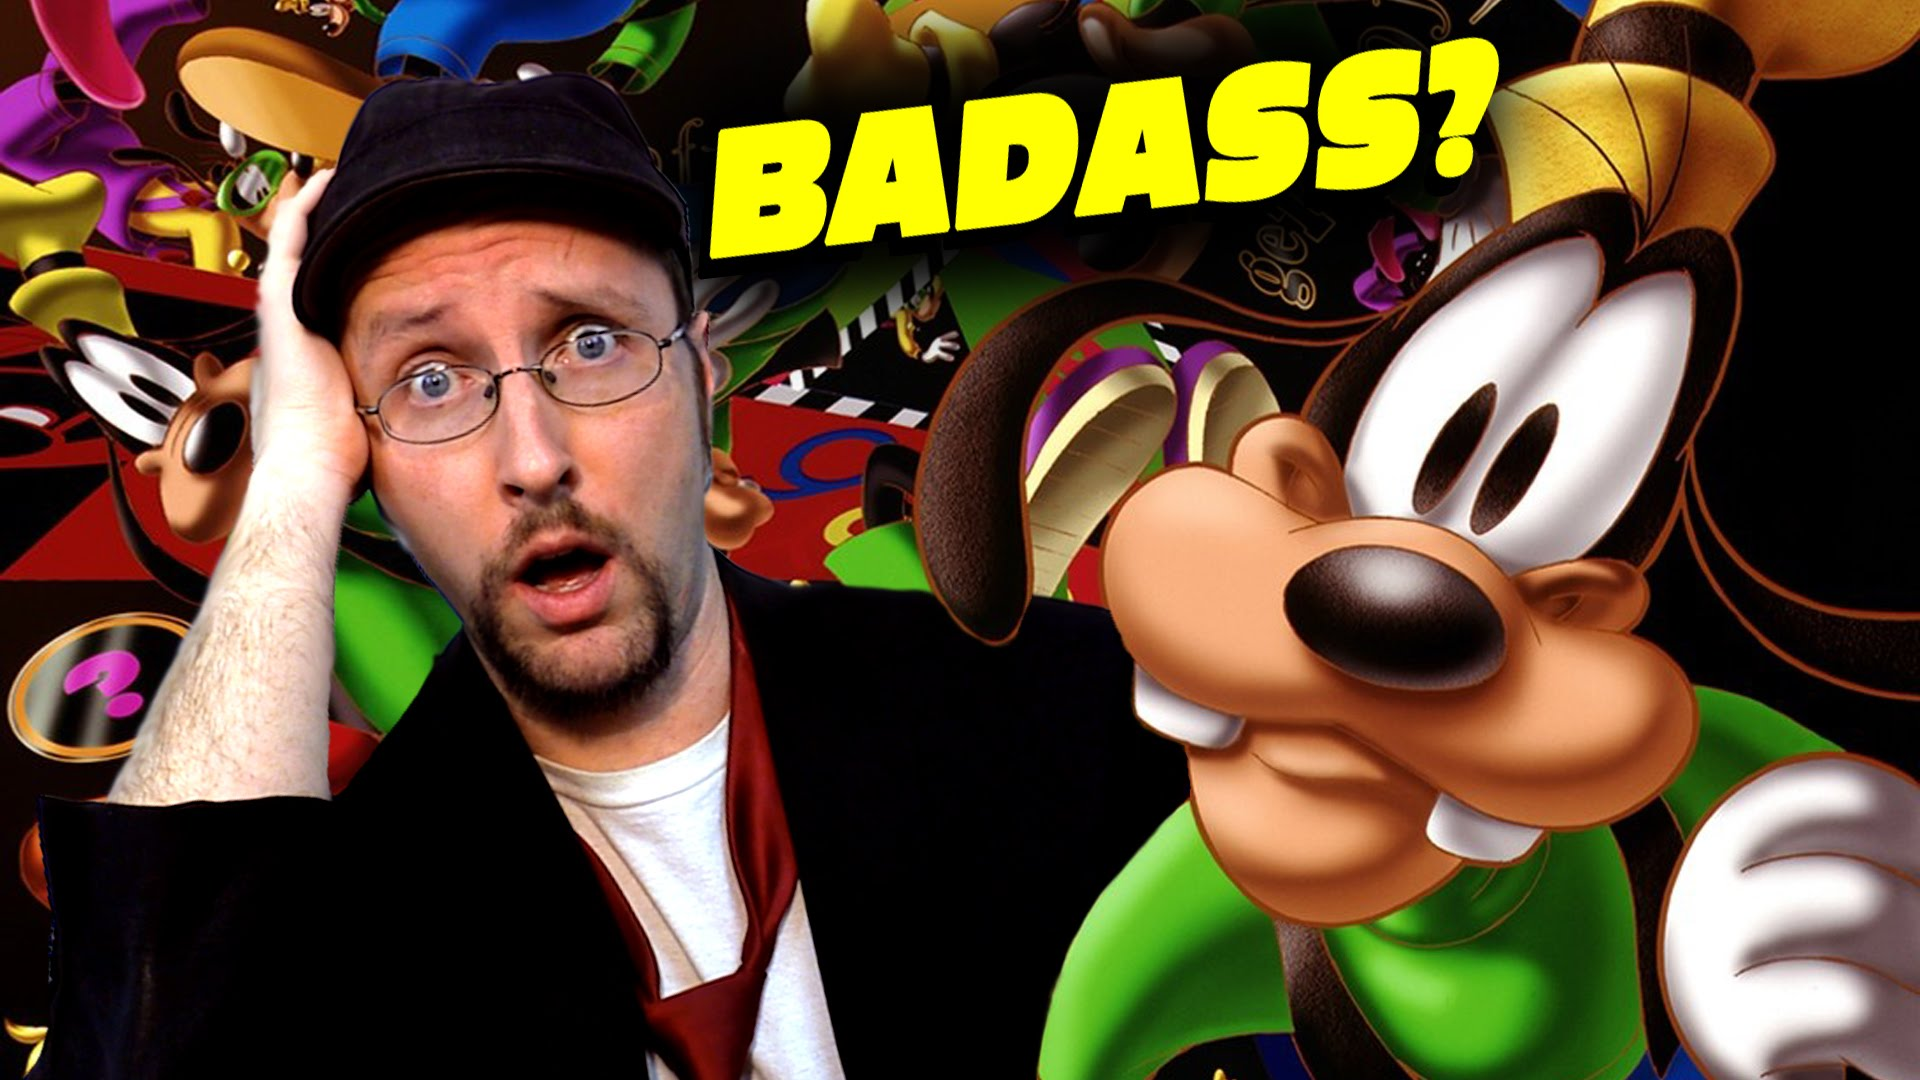 Is Goofy Secretly Badass?   Channel Awesome   FANDOM powered by Wikia